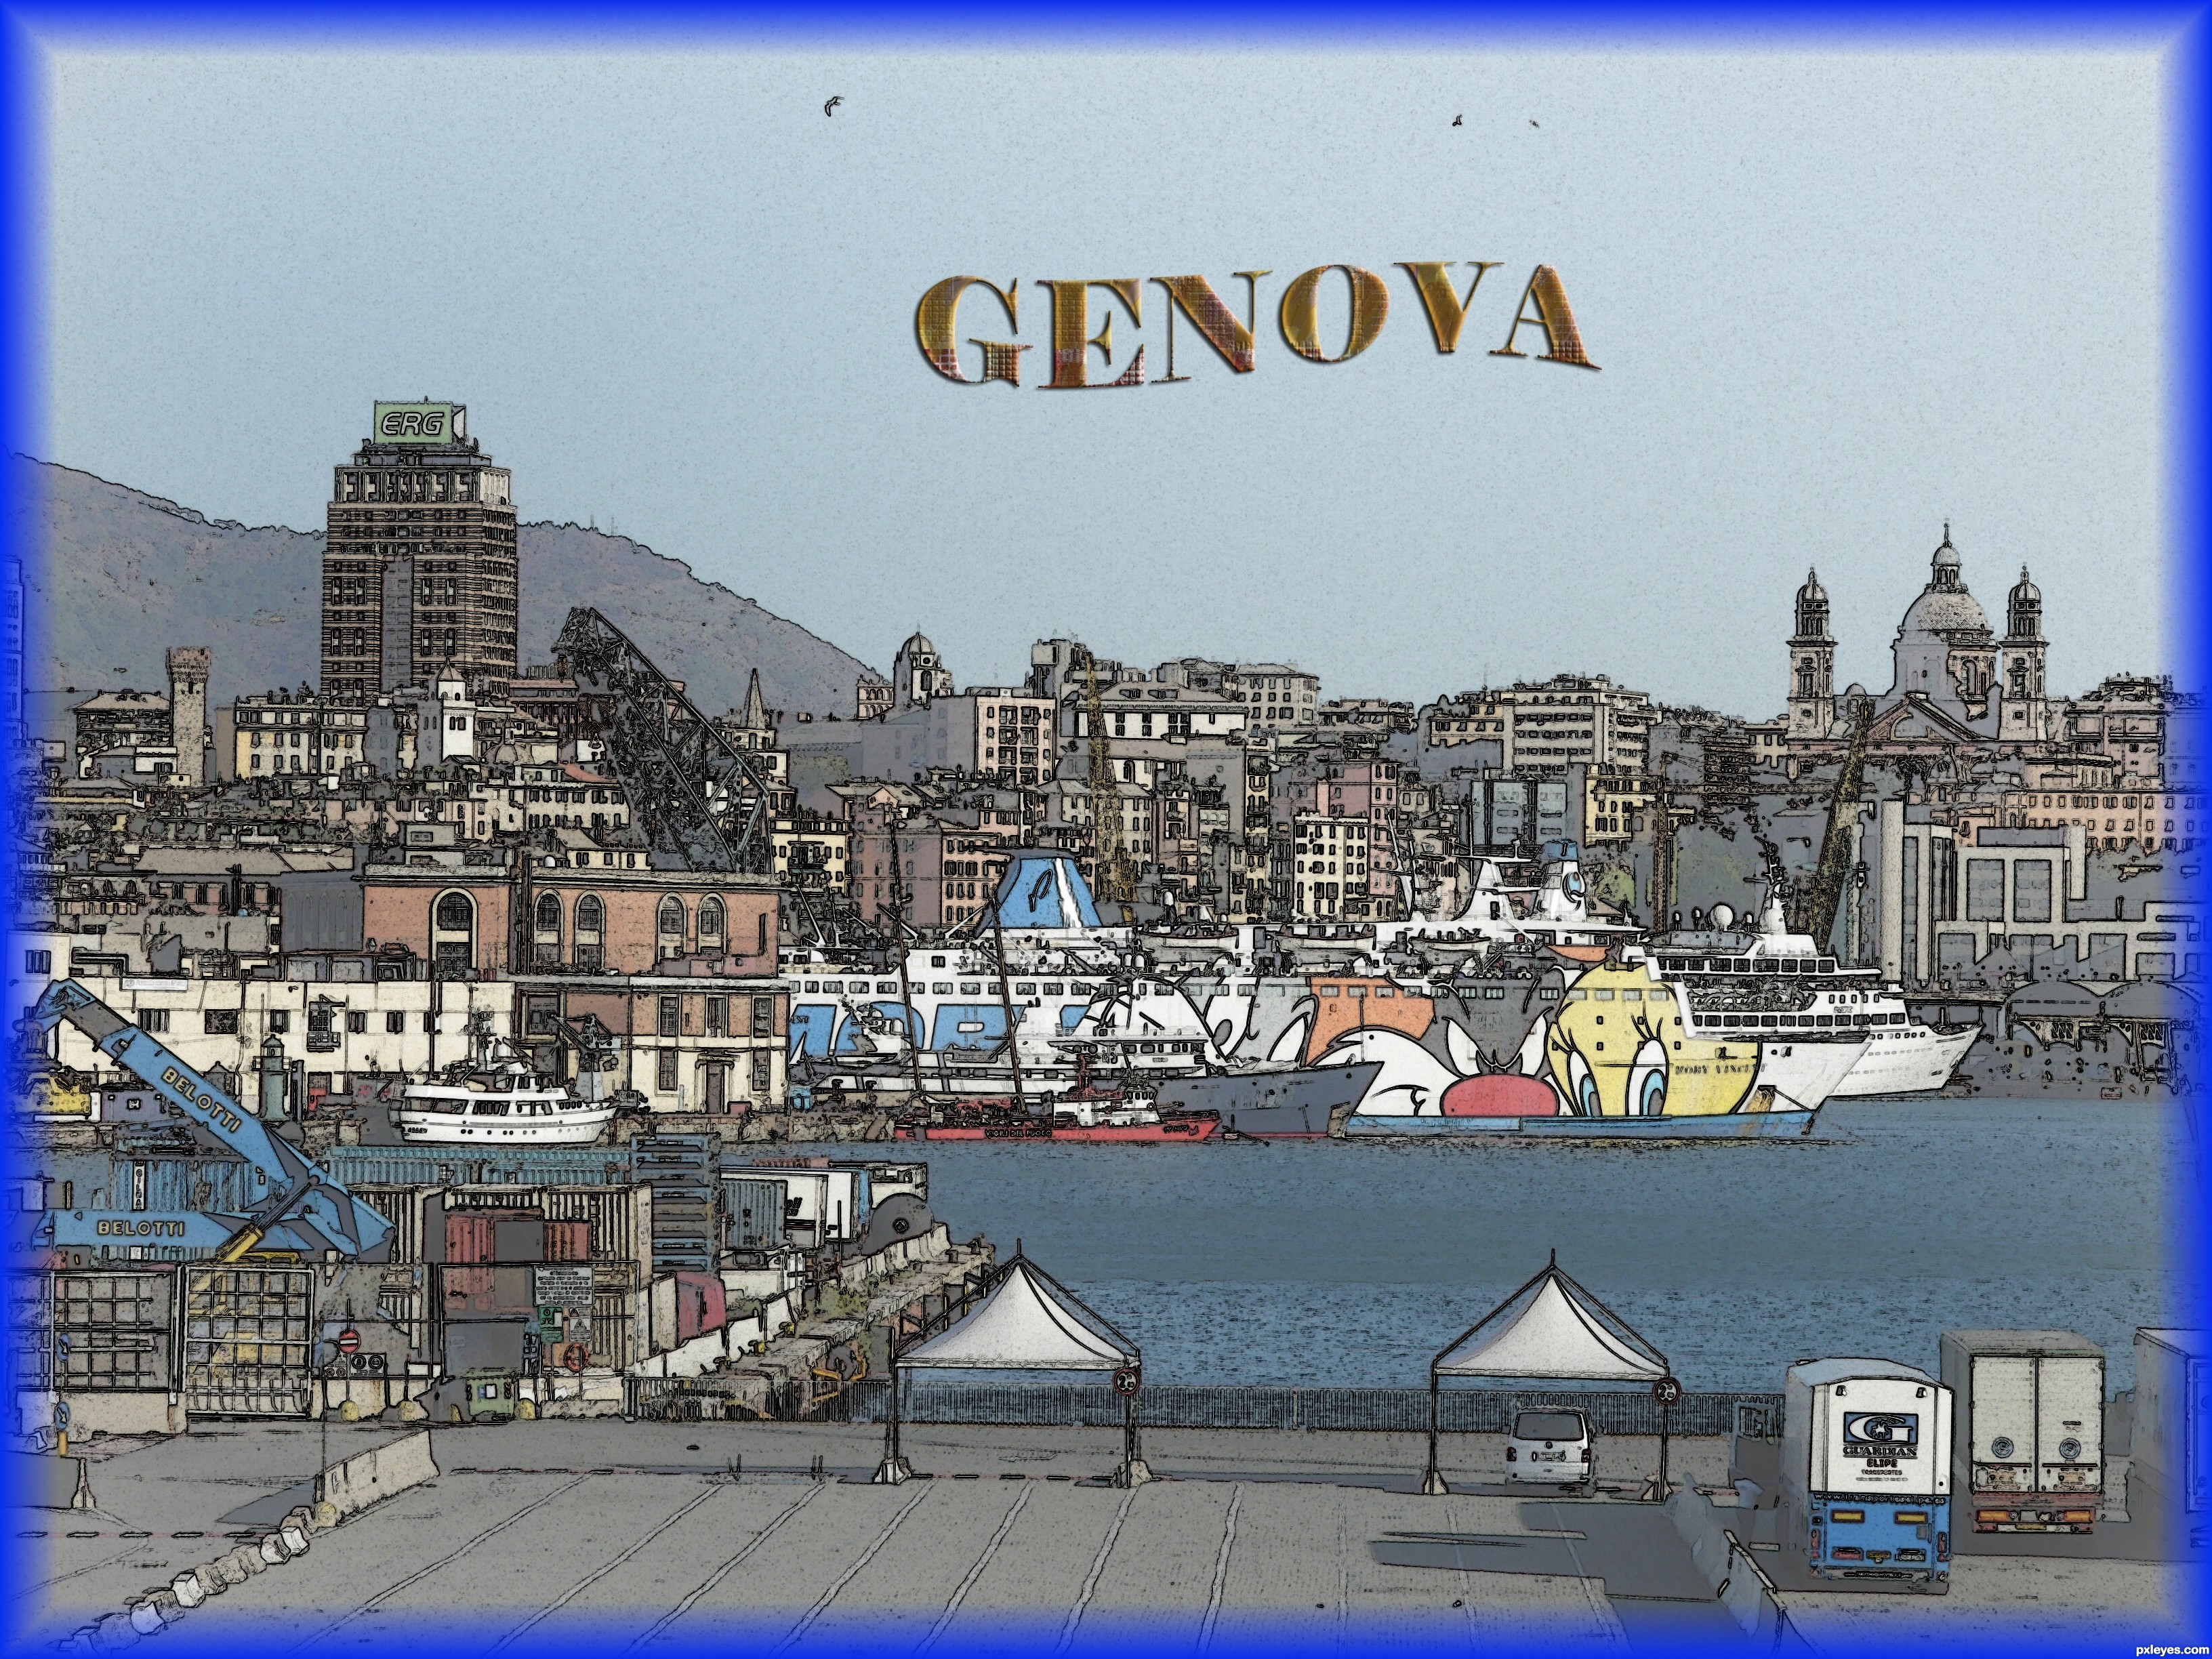 genova - photo #42